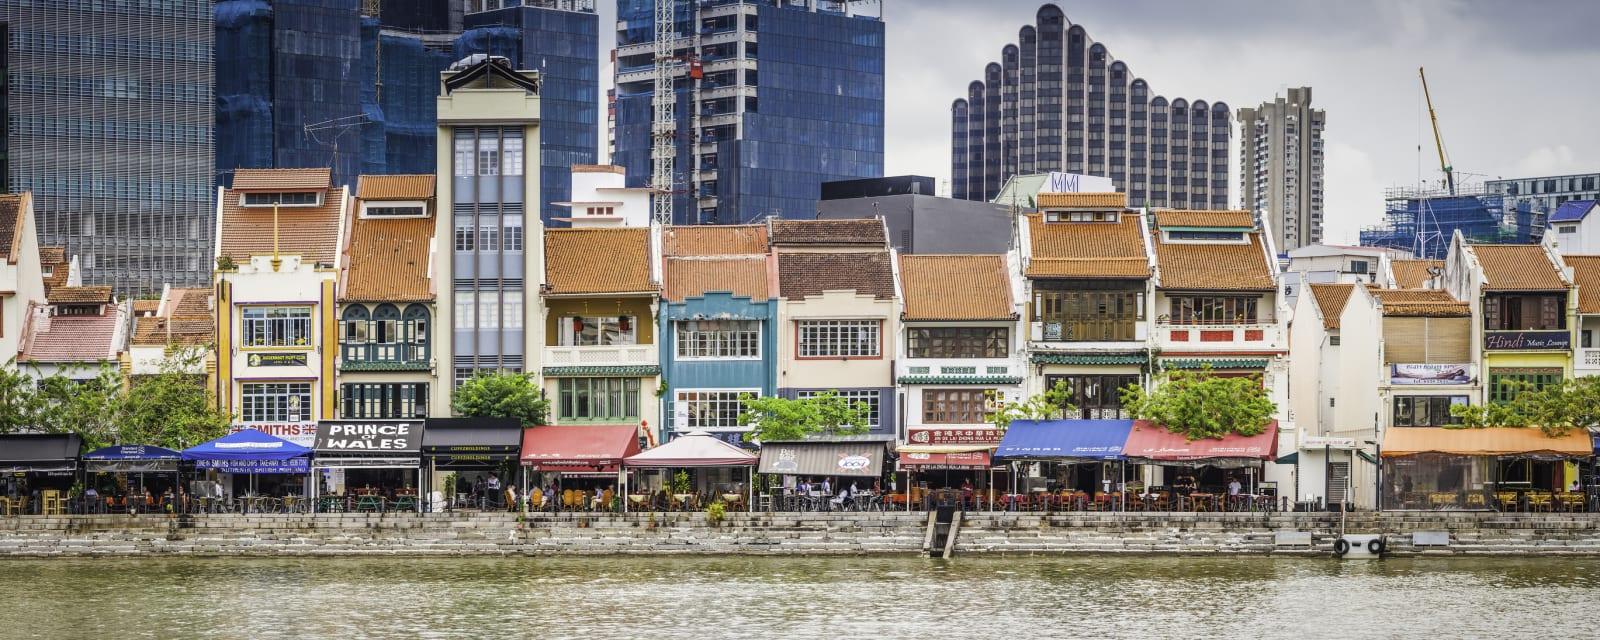 Boat Quay restaurants and bars